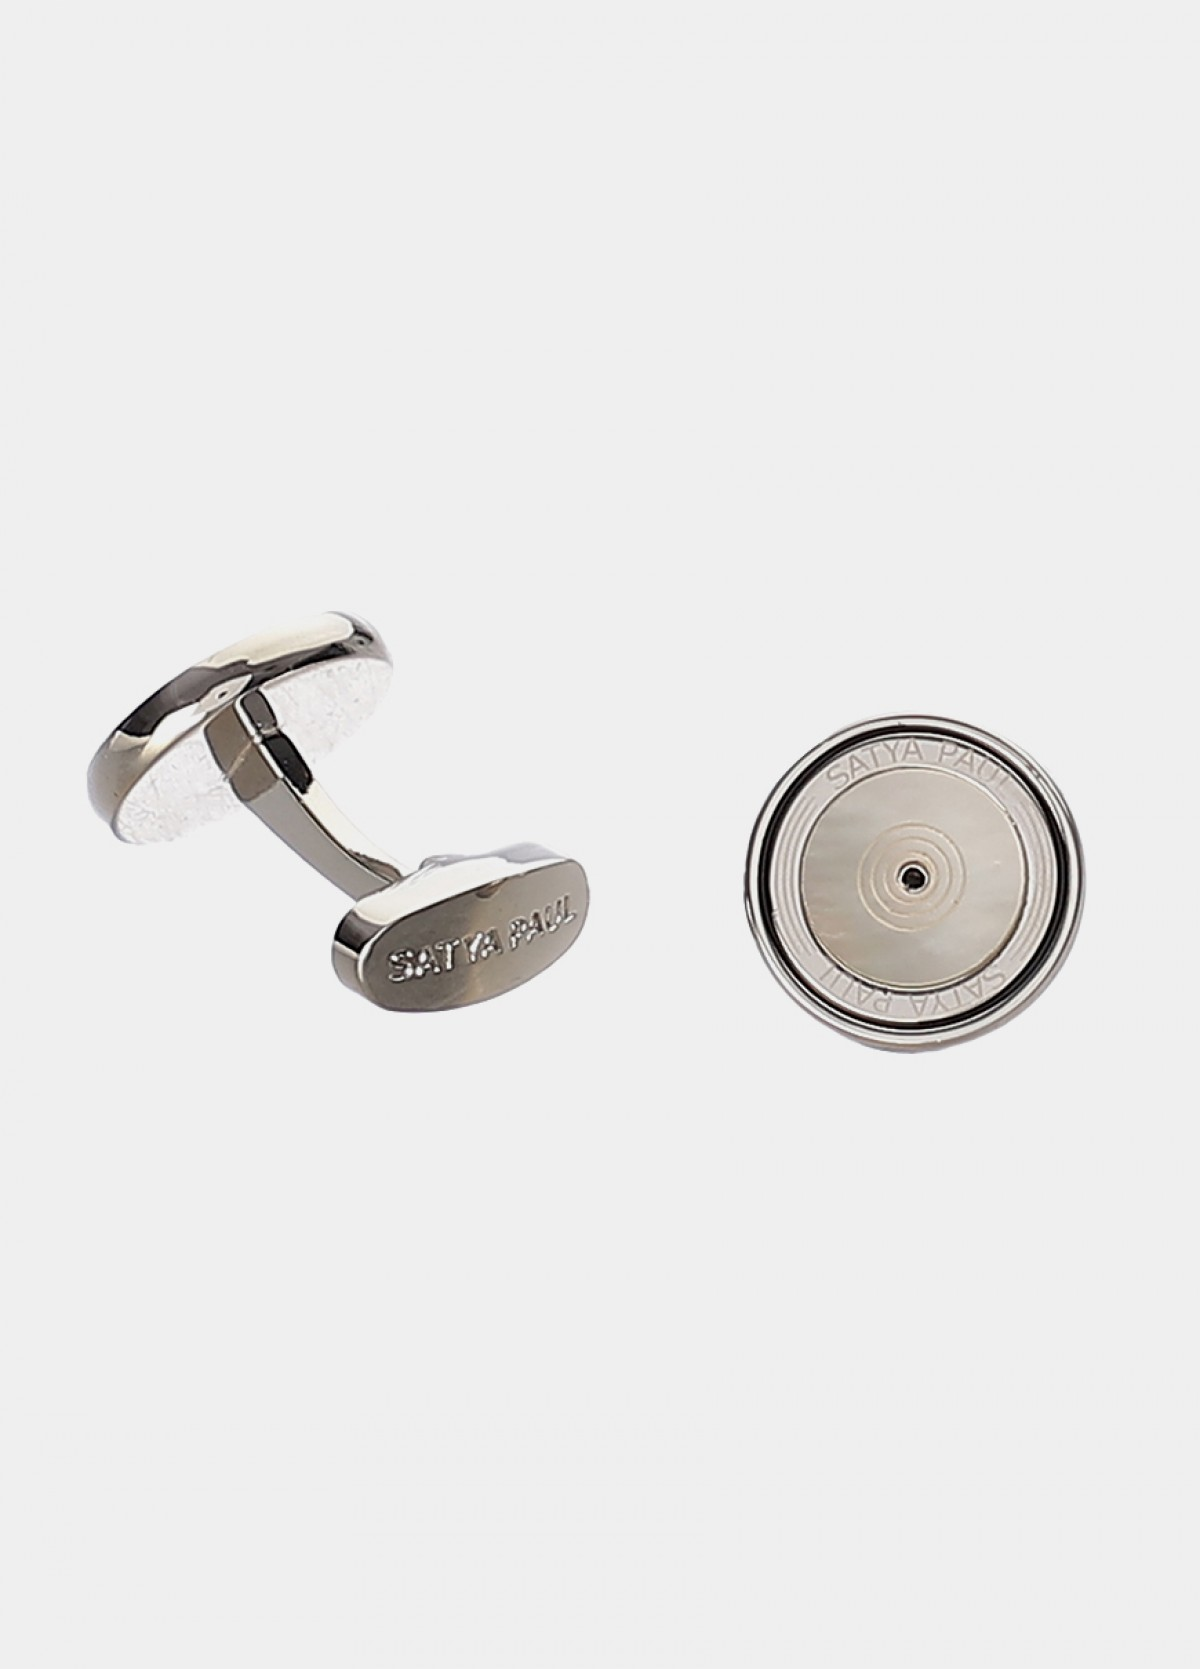 White Metal Cufflinks